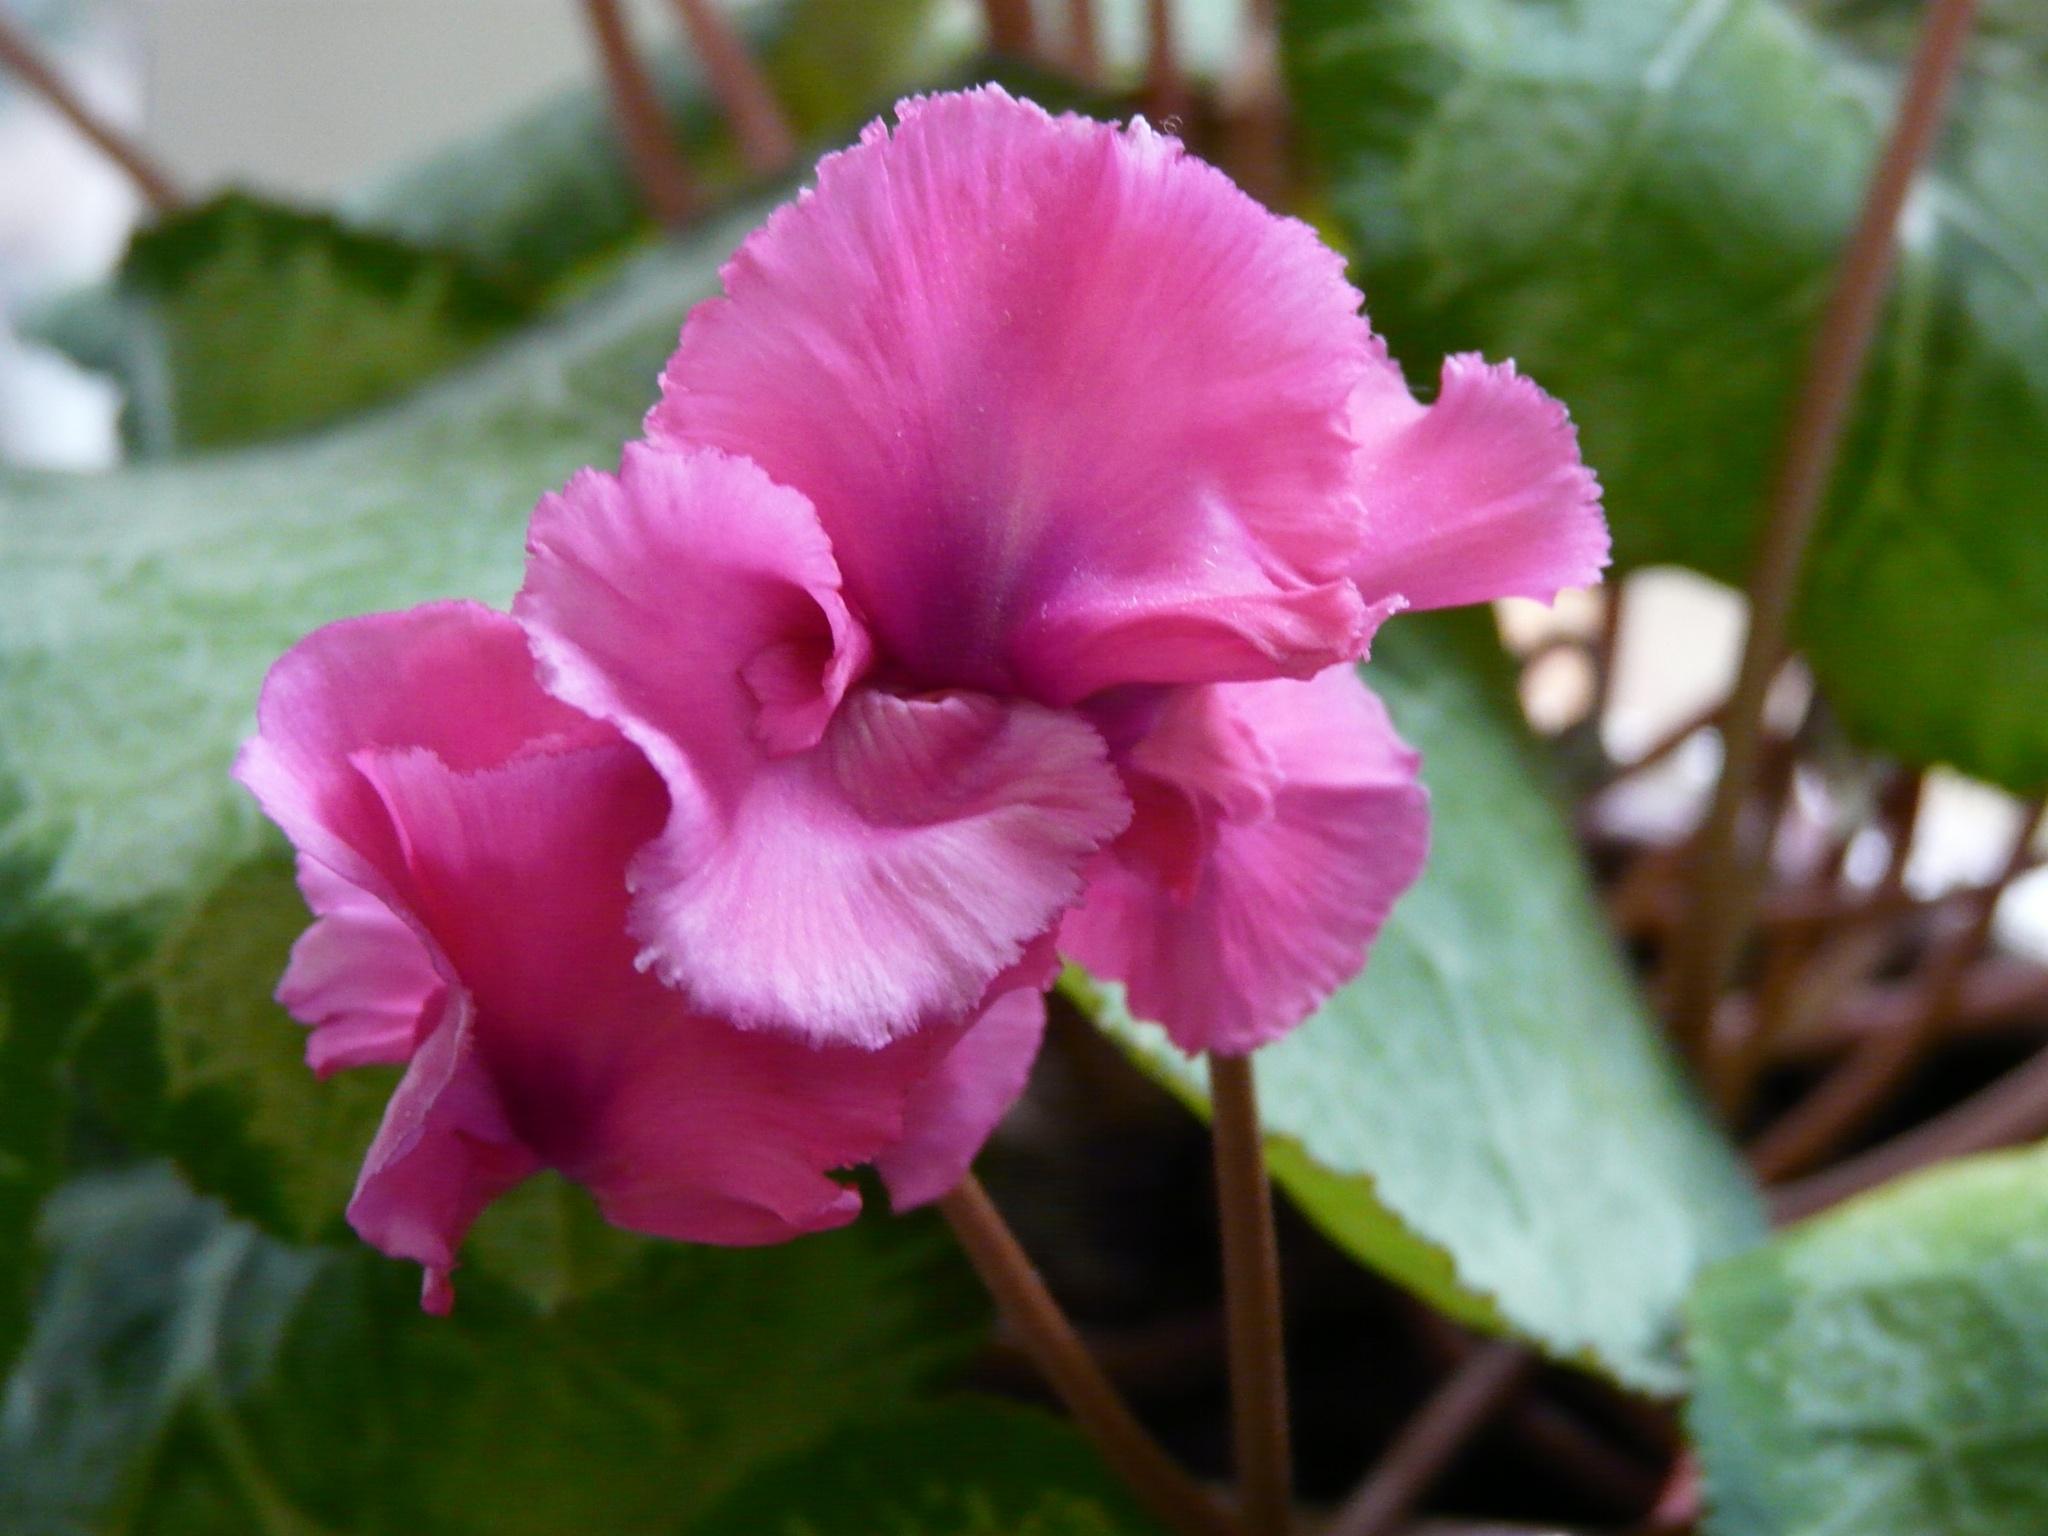 Cyclamen flower by marlene burt